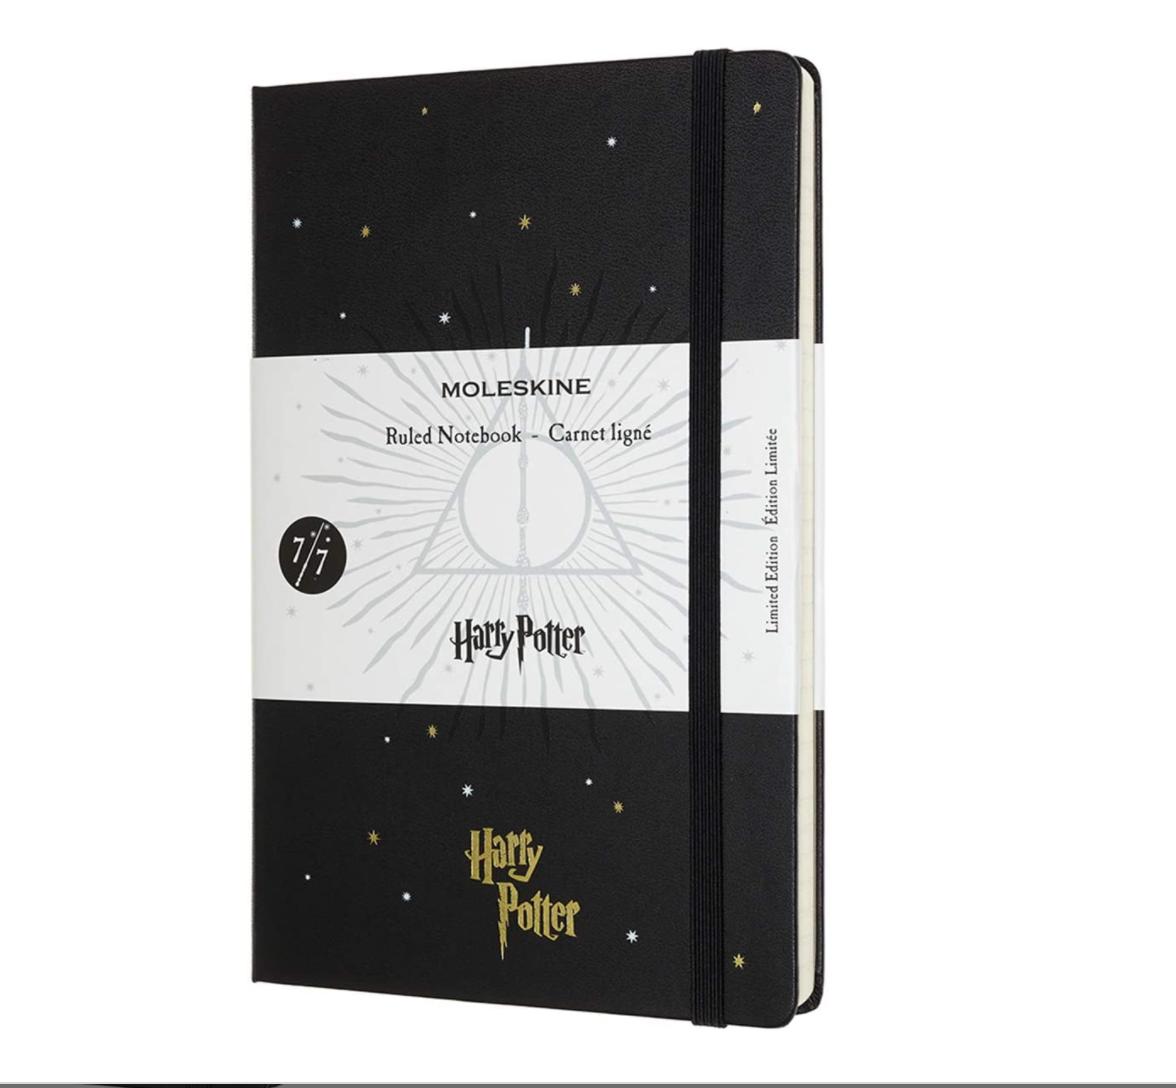 Moleskine Limited Edition Harry Potter Notebook image